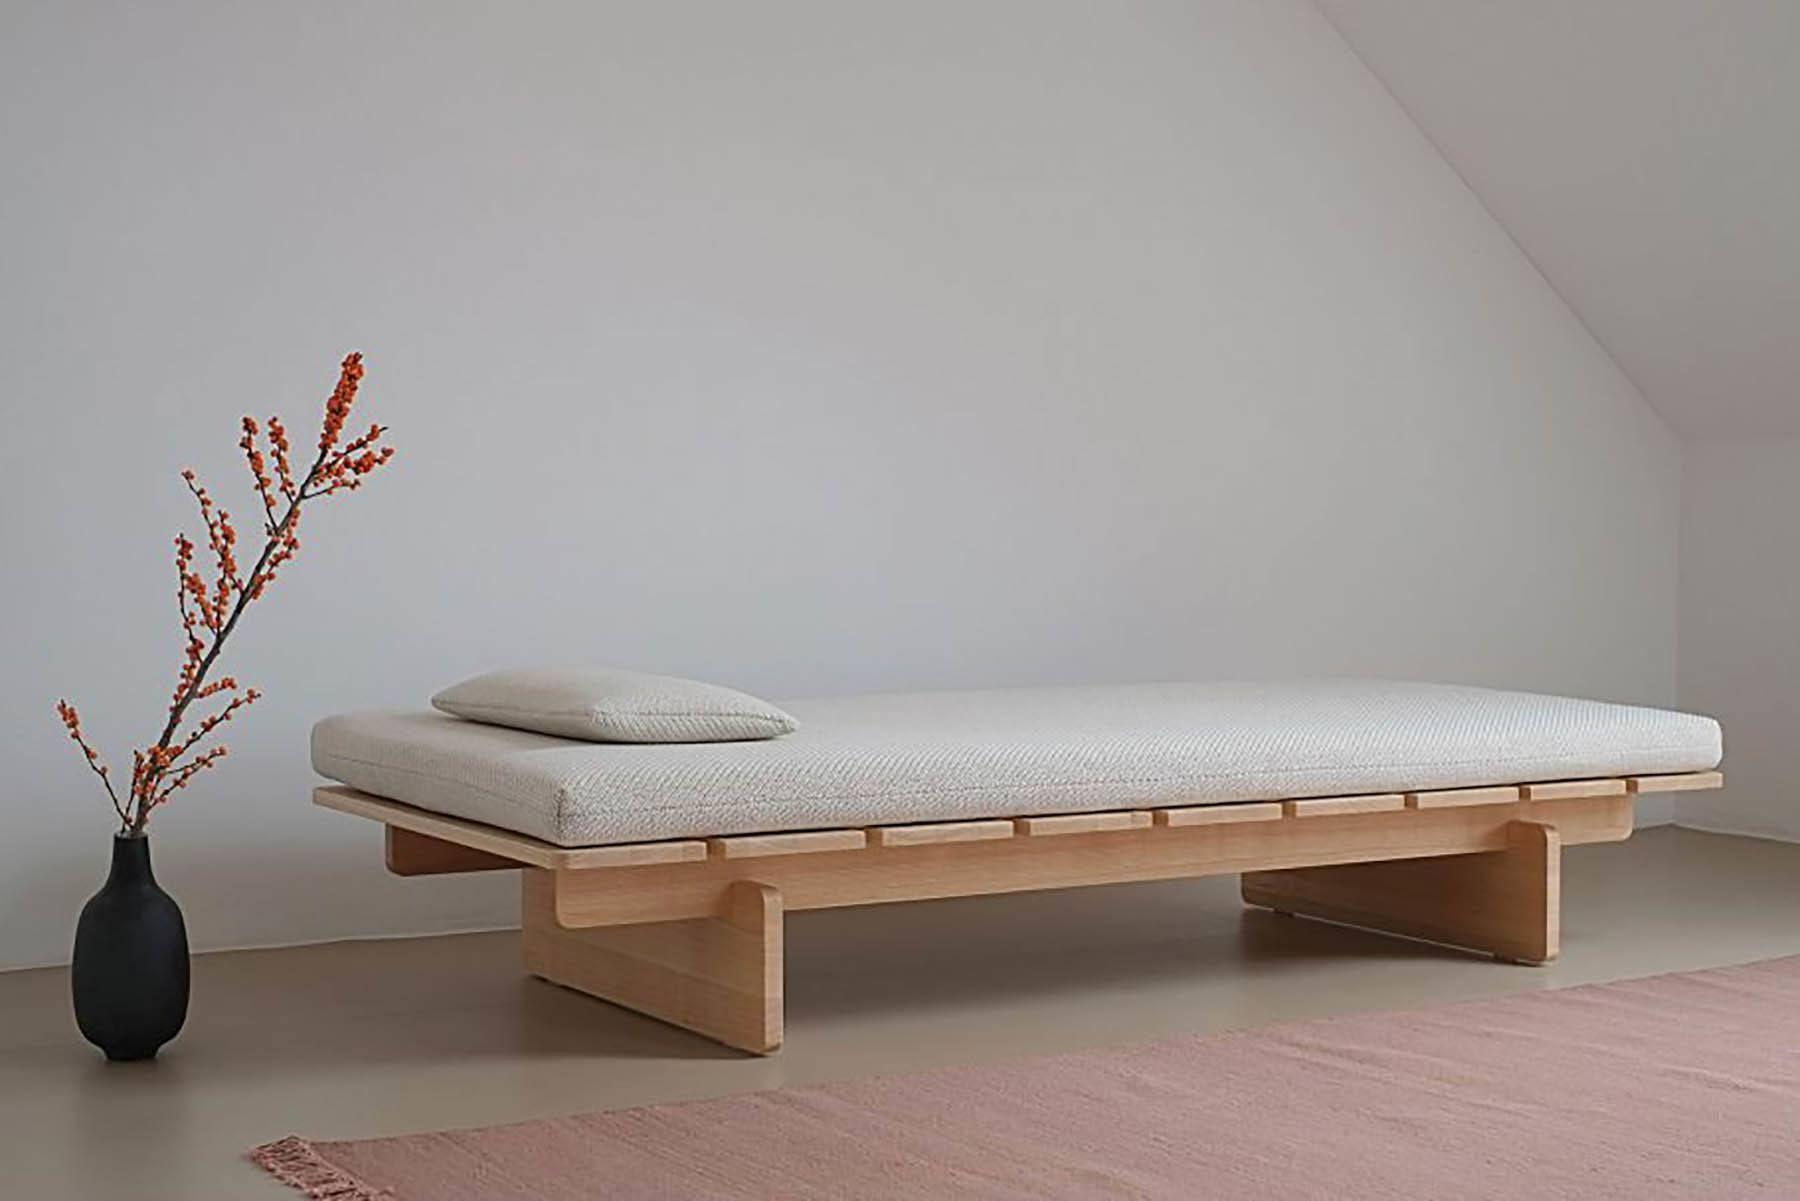 Johannes Fuchs' Elegant Design Is Perfect For Daytime Naps Or Overnight Visitors - IGNANT -  IGNANT-Design-Johannes-Fuchs-Barril-2  - #Daytime #design #Elegant #Fuchs #furnituredesignbedroom #furnituredesigndiy #furnituredesigndiyroomdecor #furnituredesignlayout #furnituredesignlivingroom #furnituredesignmodern #furnituredesignsketches #furnituredesignwooden #ignant #Johannes #livingroomdecor #Naps #Overnight #Perfect #Visitors